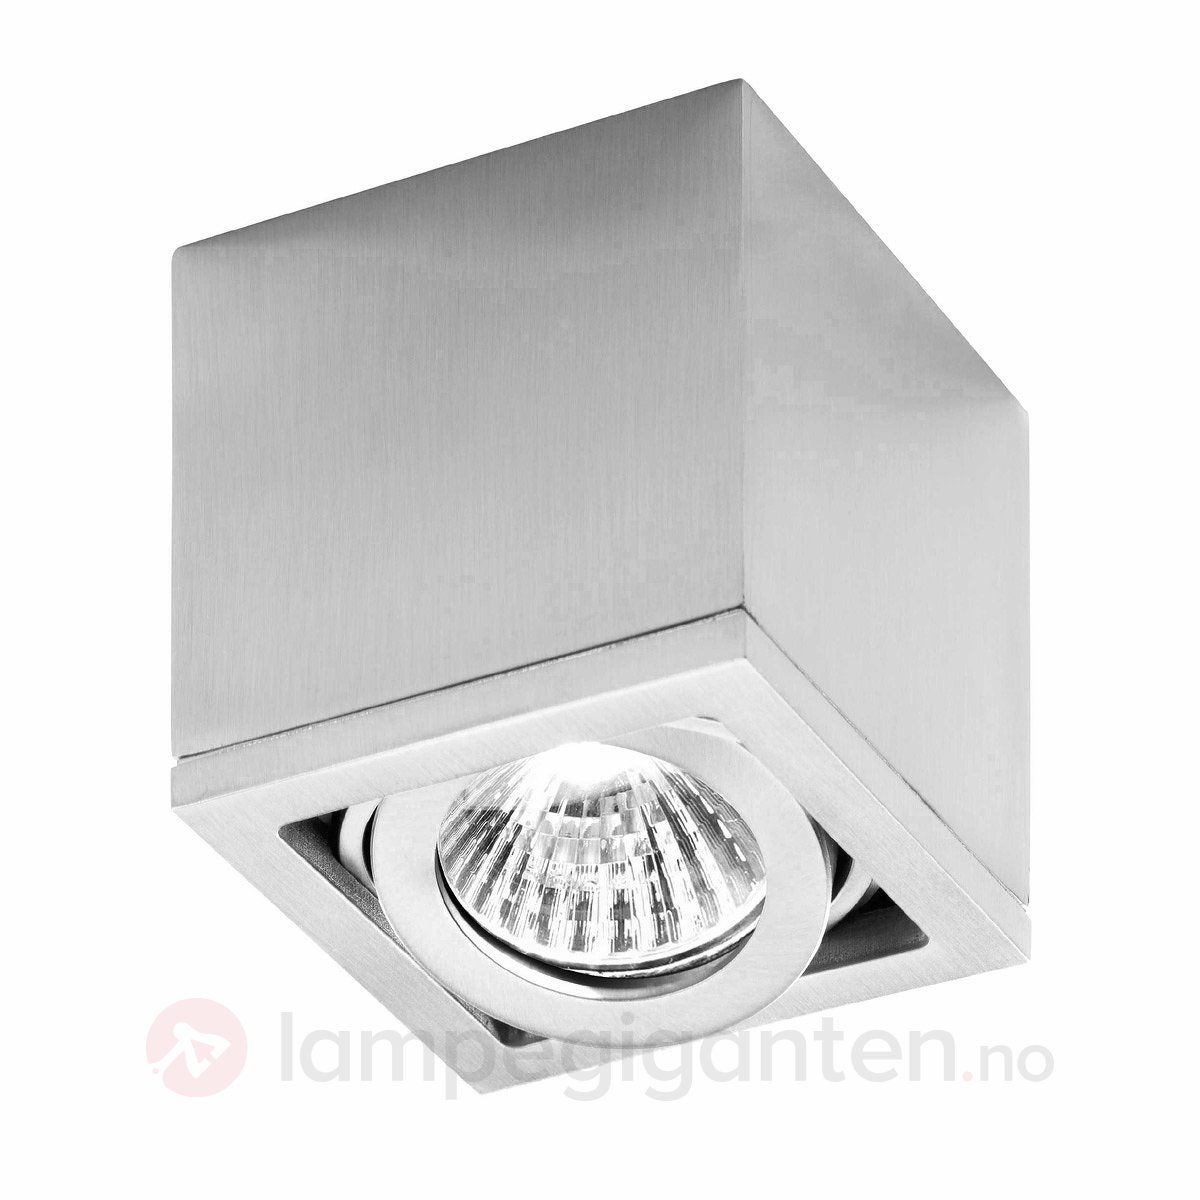 Justerbar Axena Led Taklampe Med 1 Lys Bestilles Enkelt Og Trygt Hos Lampegiganten No Led Home Lighting Container